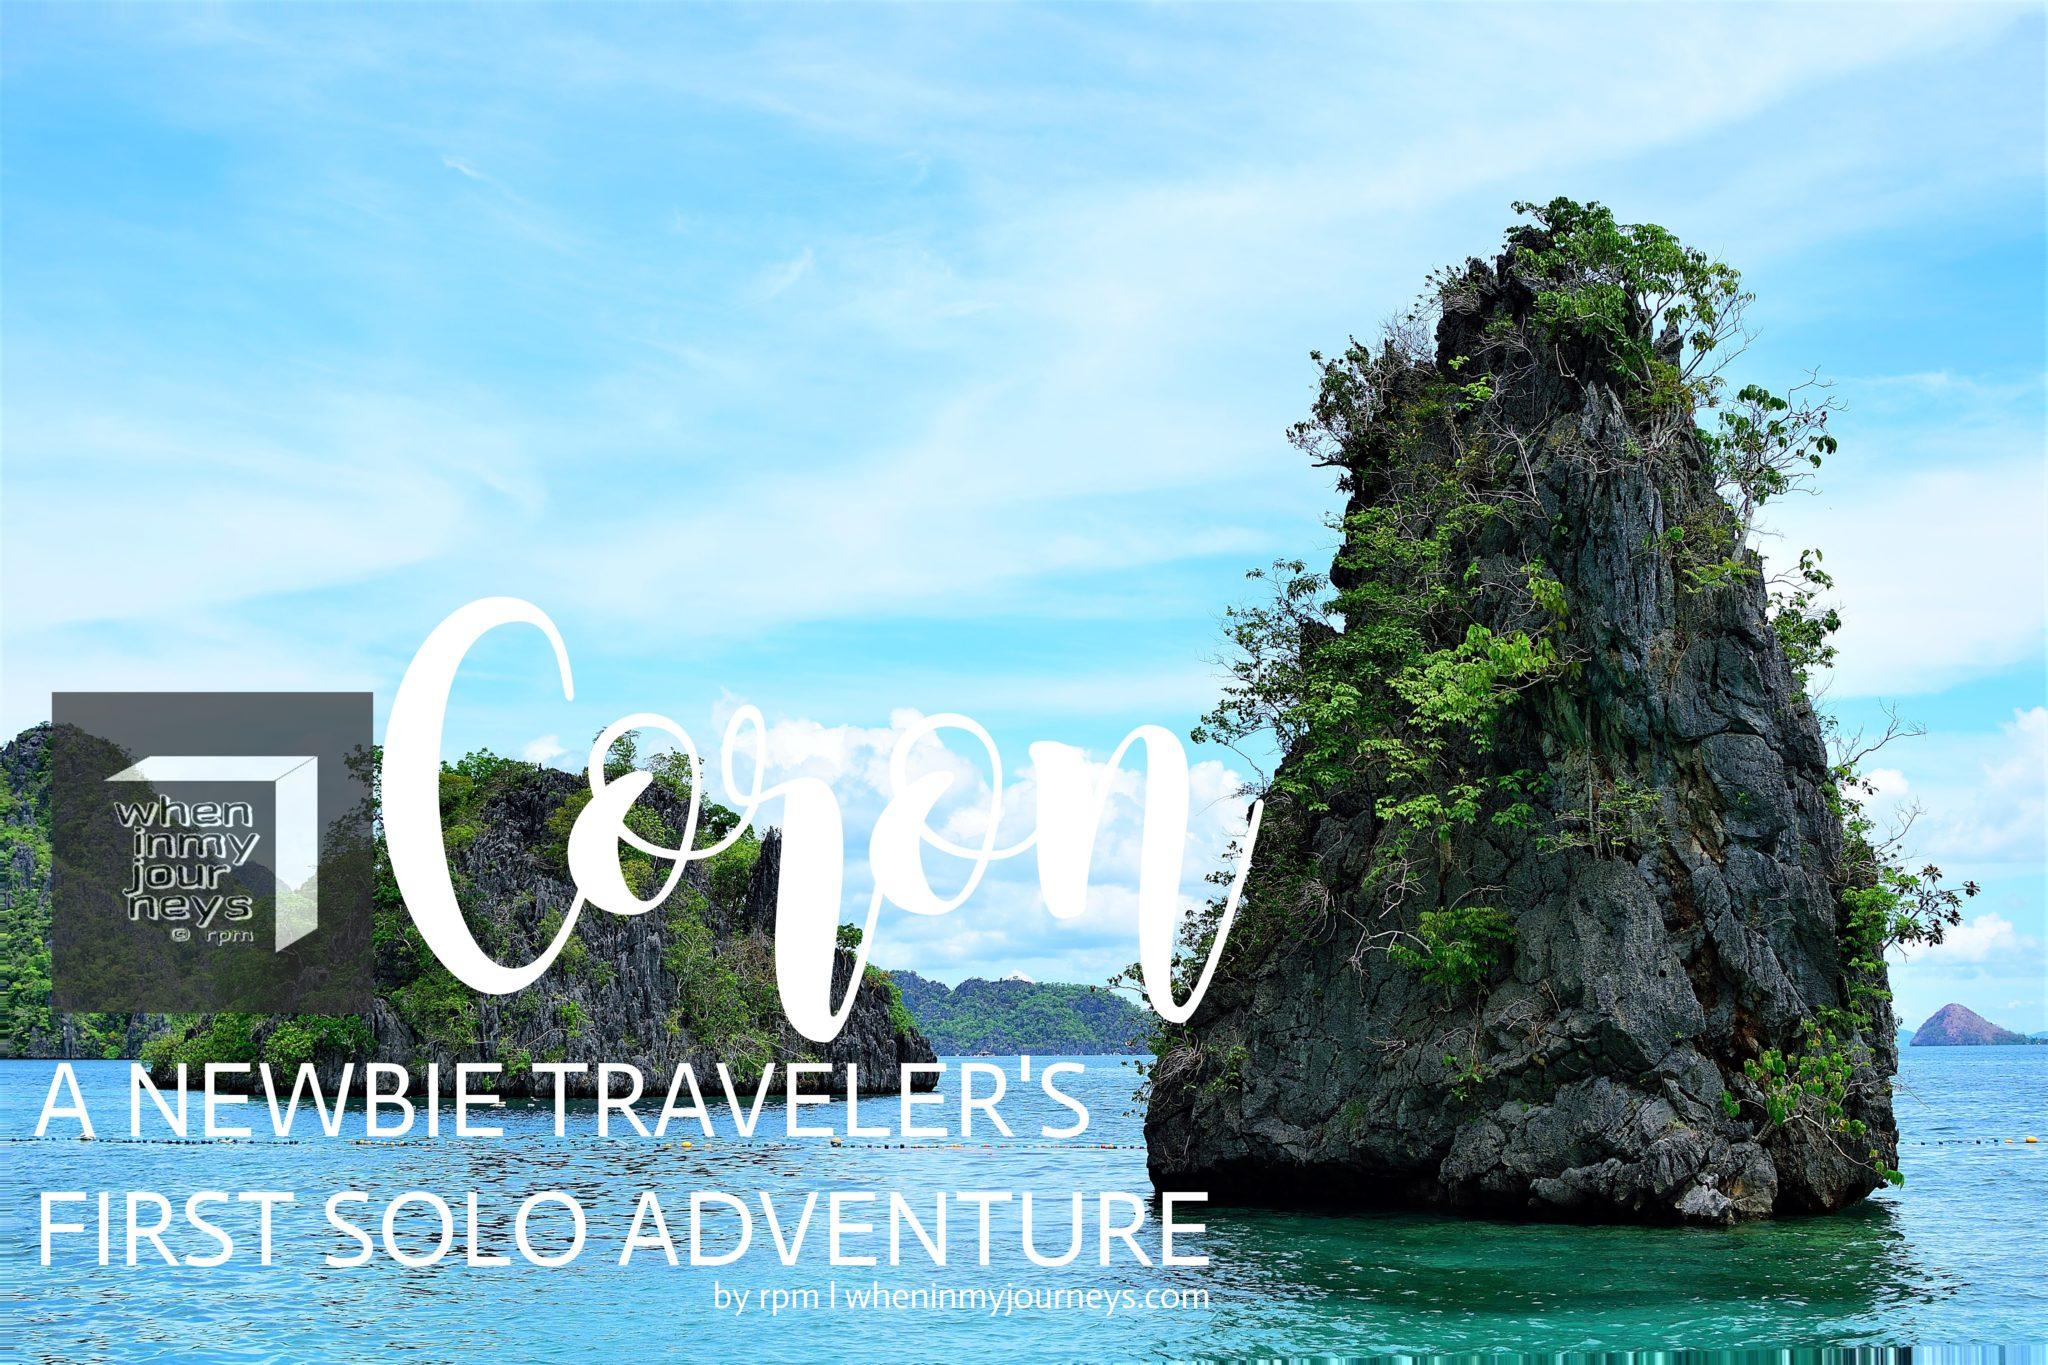 Coron A Newbie Traveler's First Solo Adventure